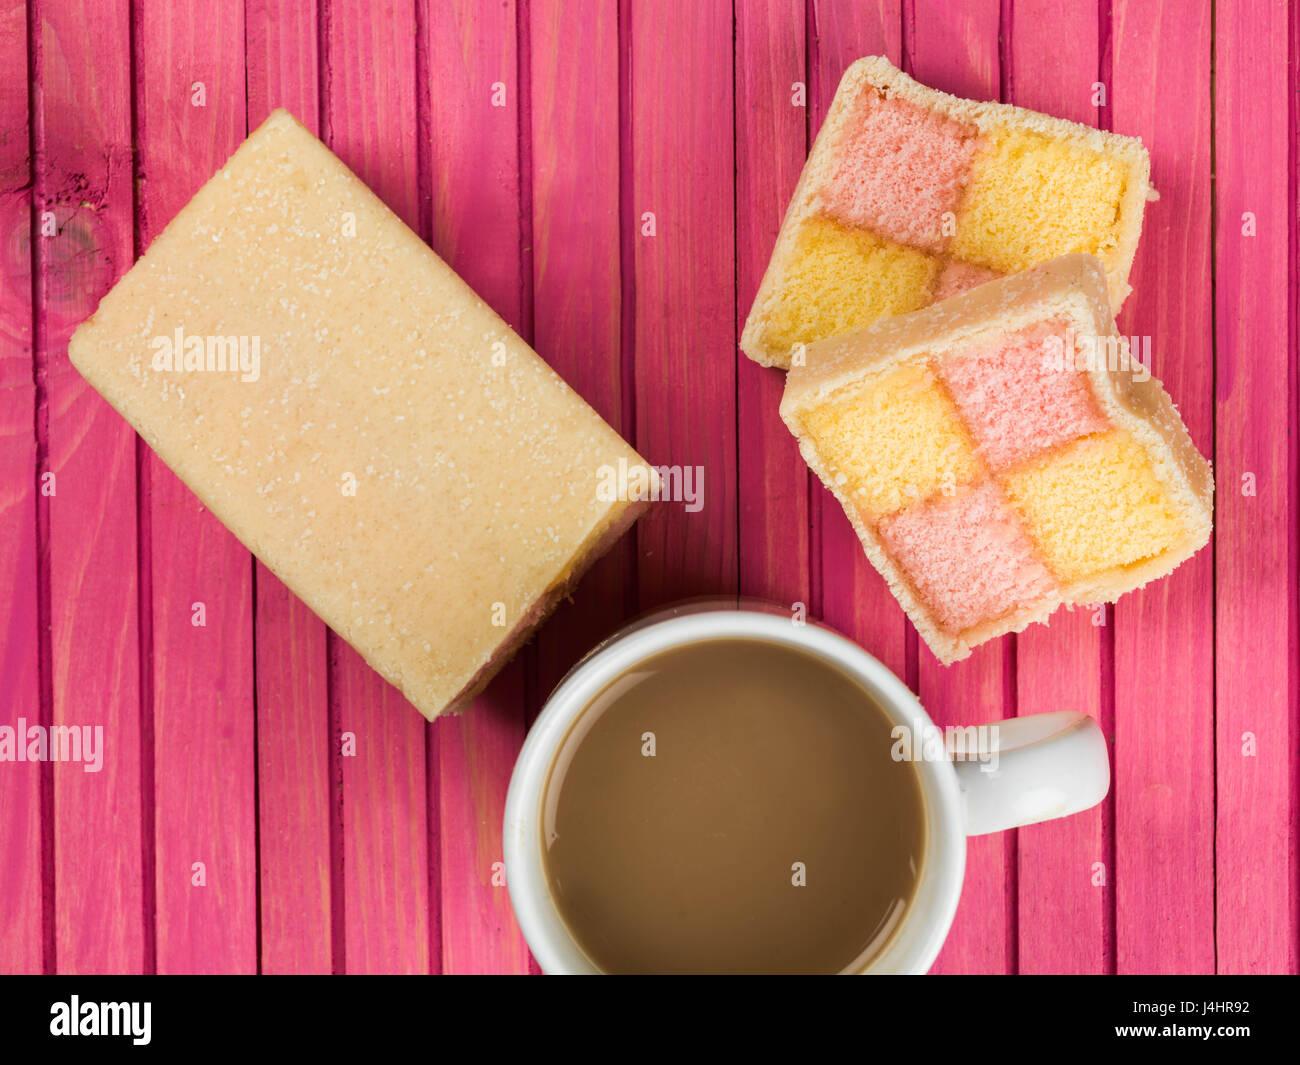 Almond Flavoured Battenberg Sponge Cake Against a Pink Background - Stock Image